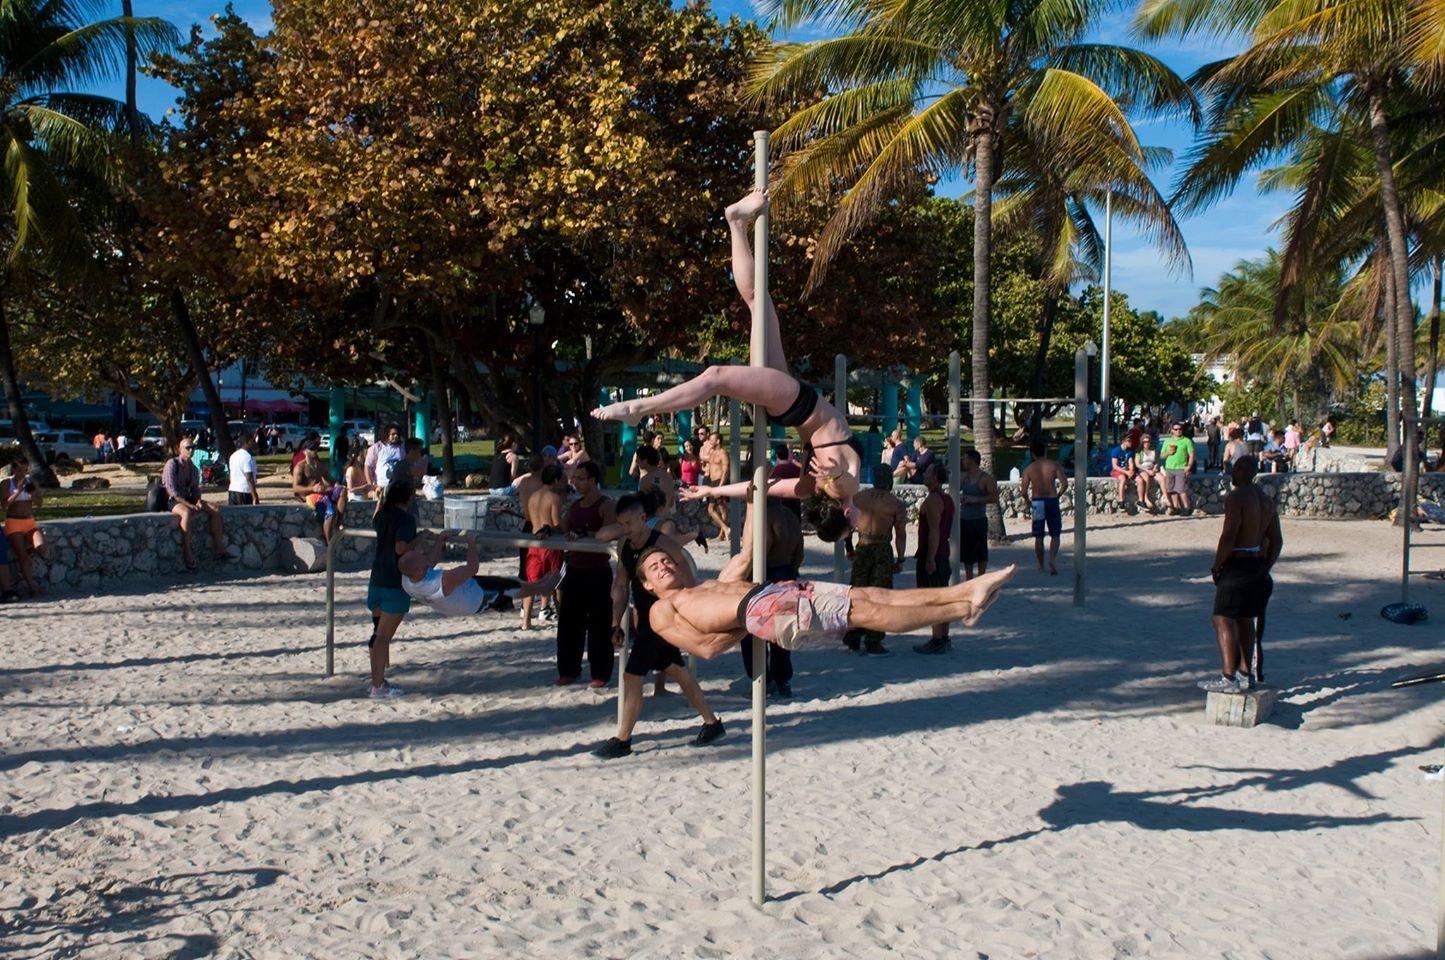 Calisthenics and pole dancing on Miami Beach